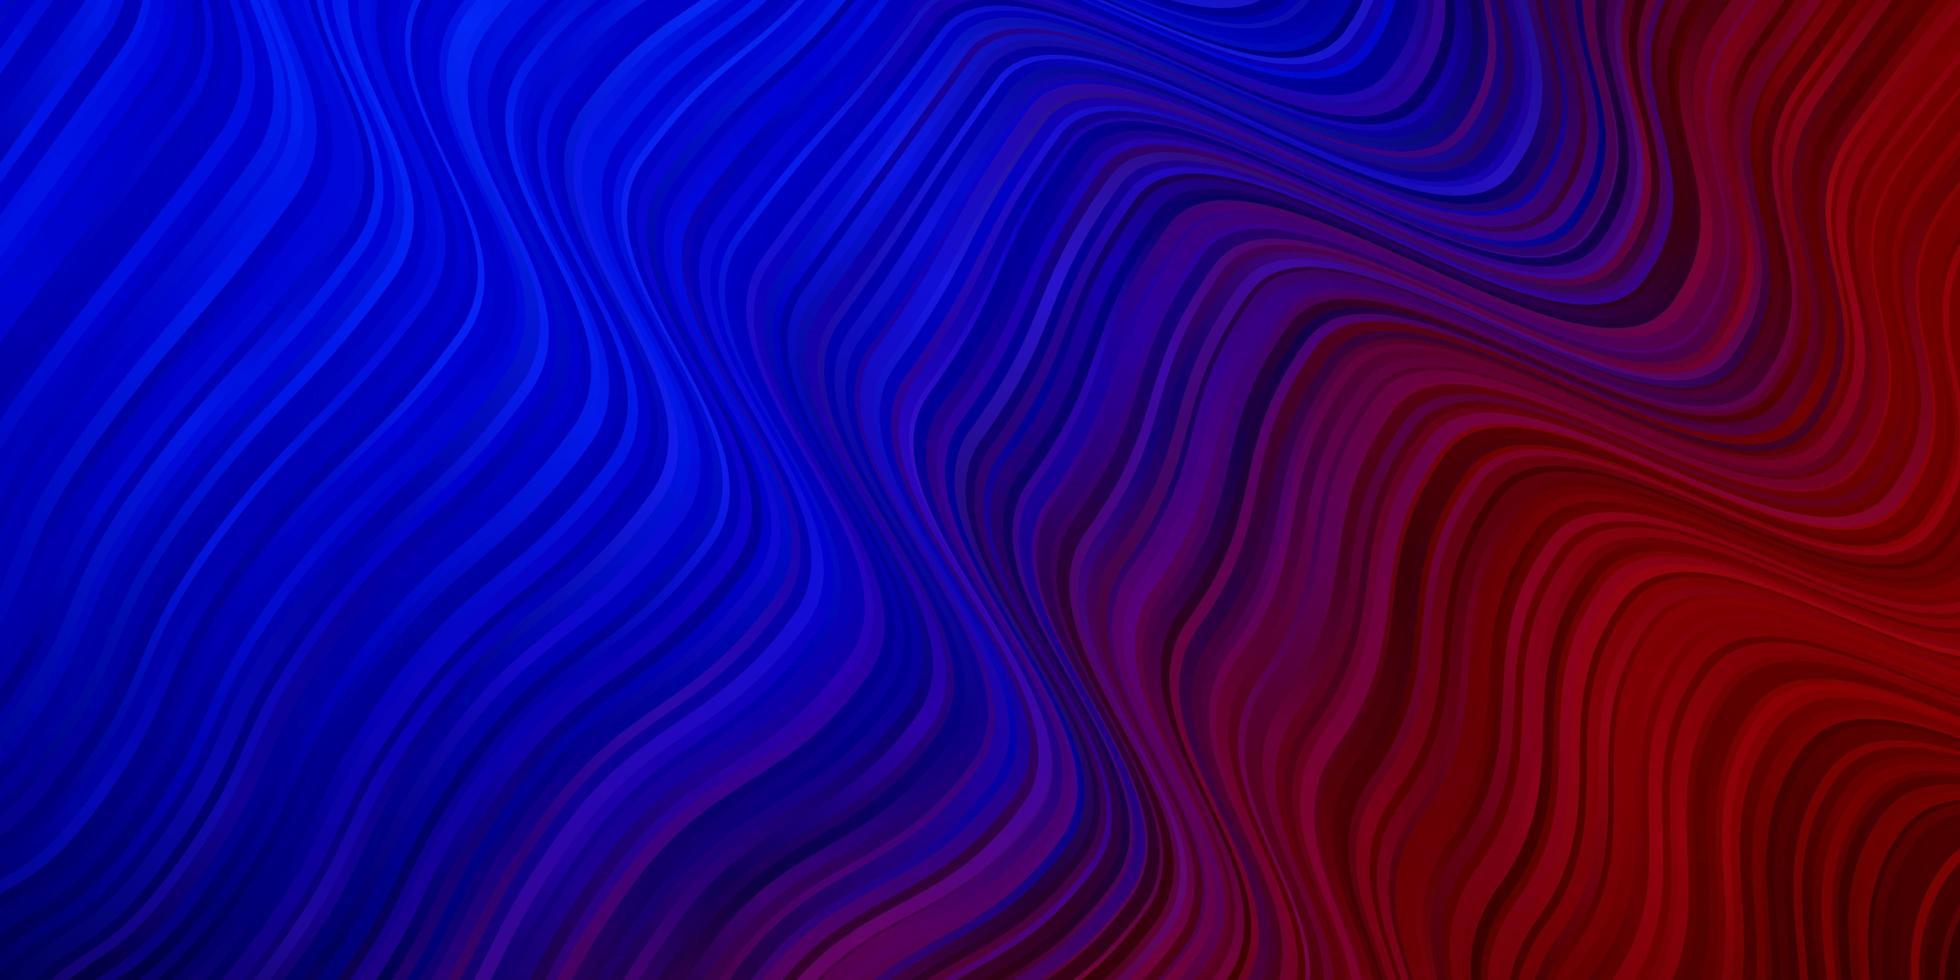 hellblaue, rote Vektortextur mit trockenen Linien. vektor